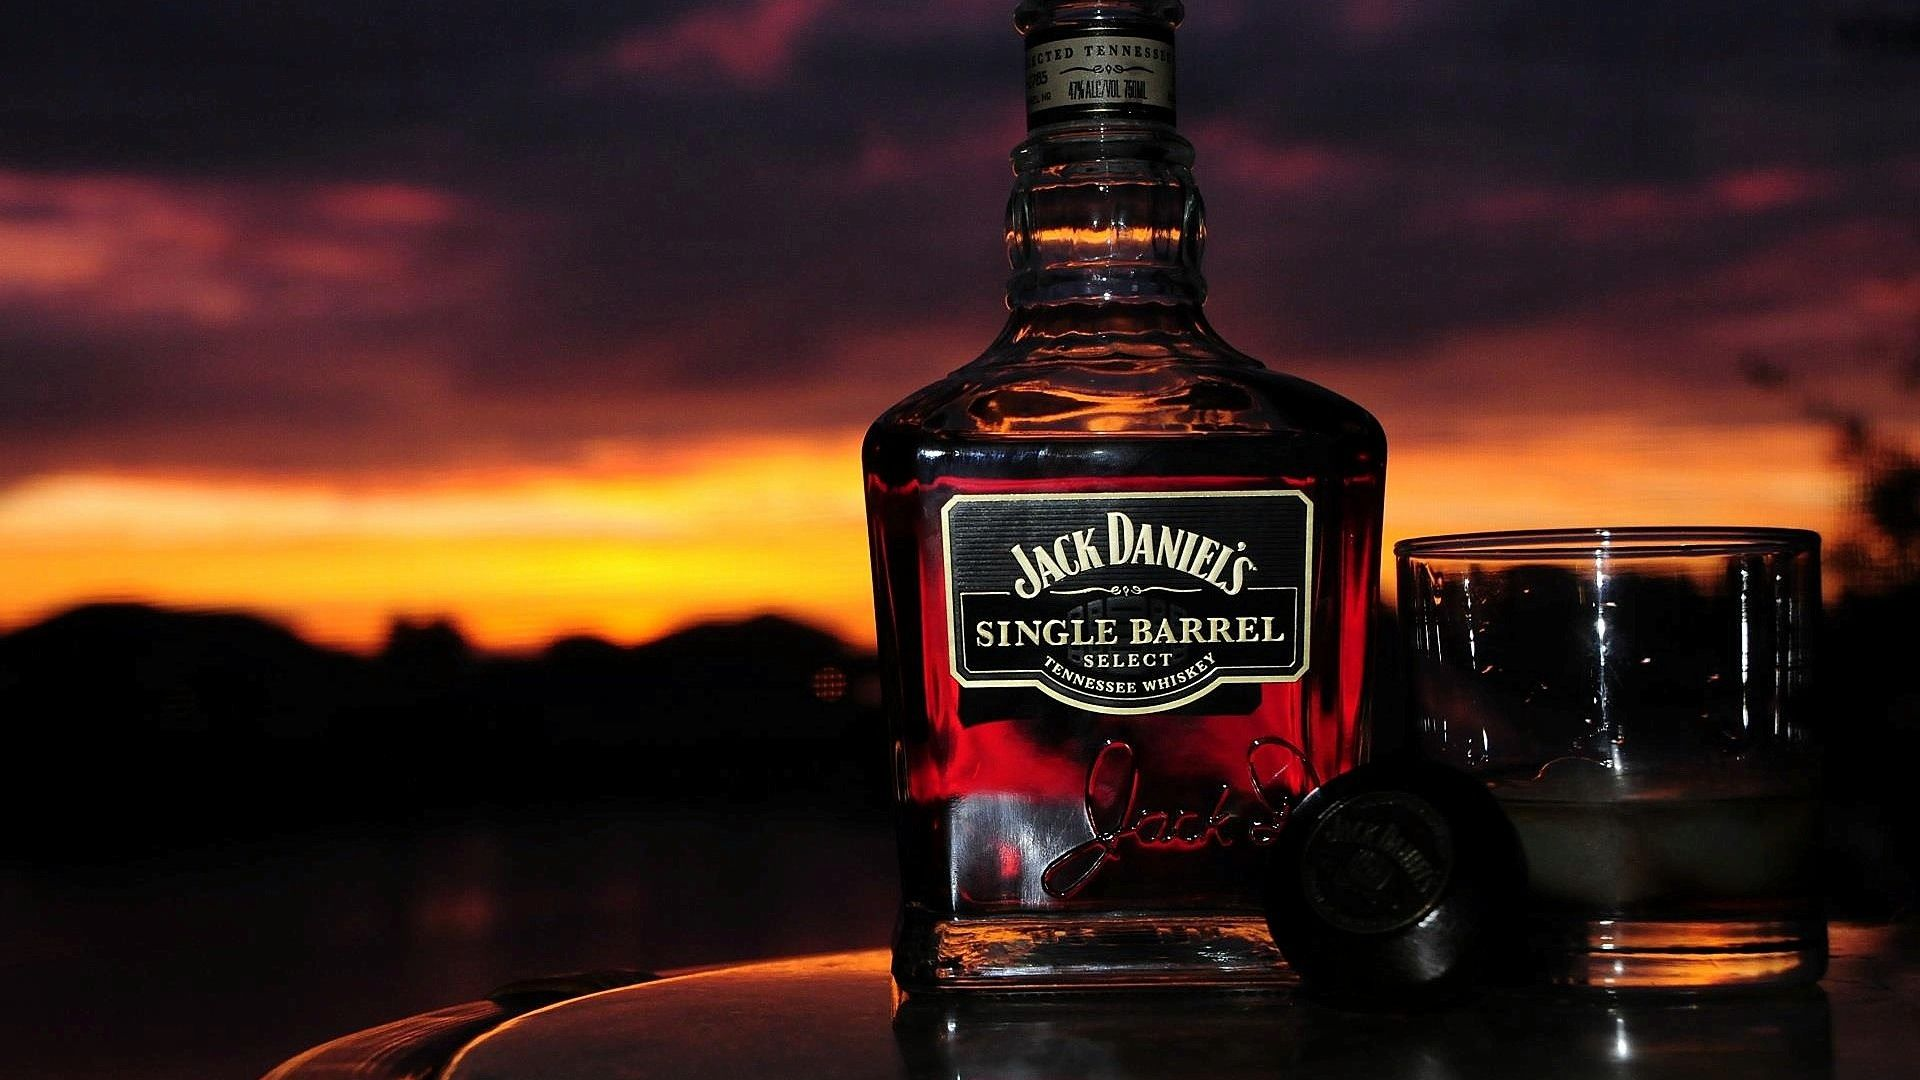 Jack Daniels Whiskey Glass Drink Alcohol 93870 1920x1080 Jpg 1920